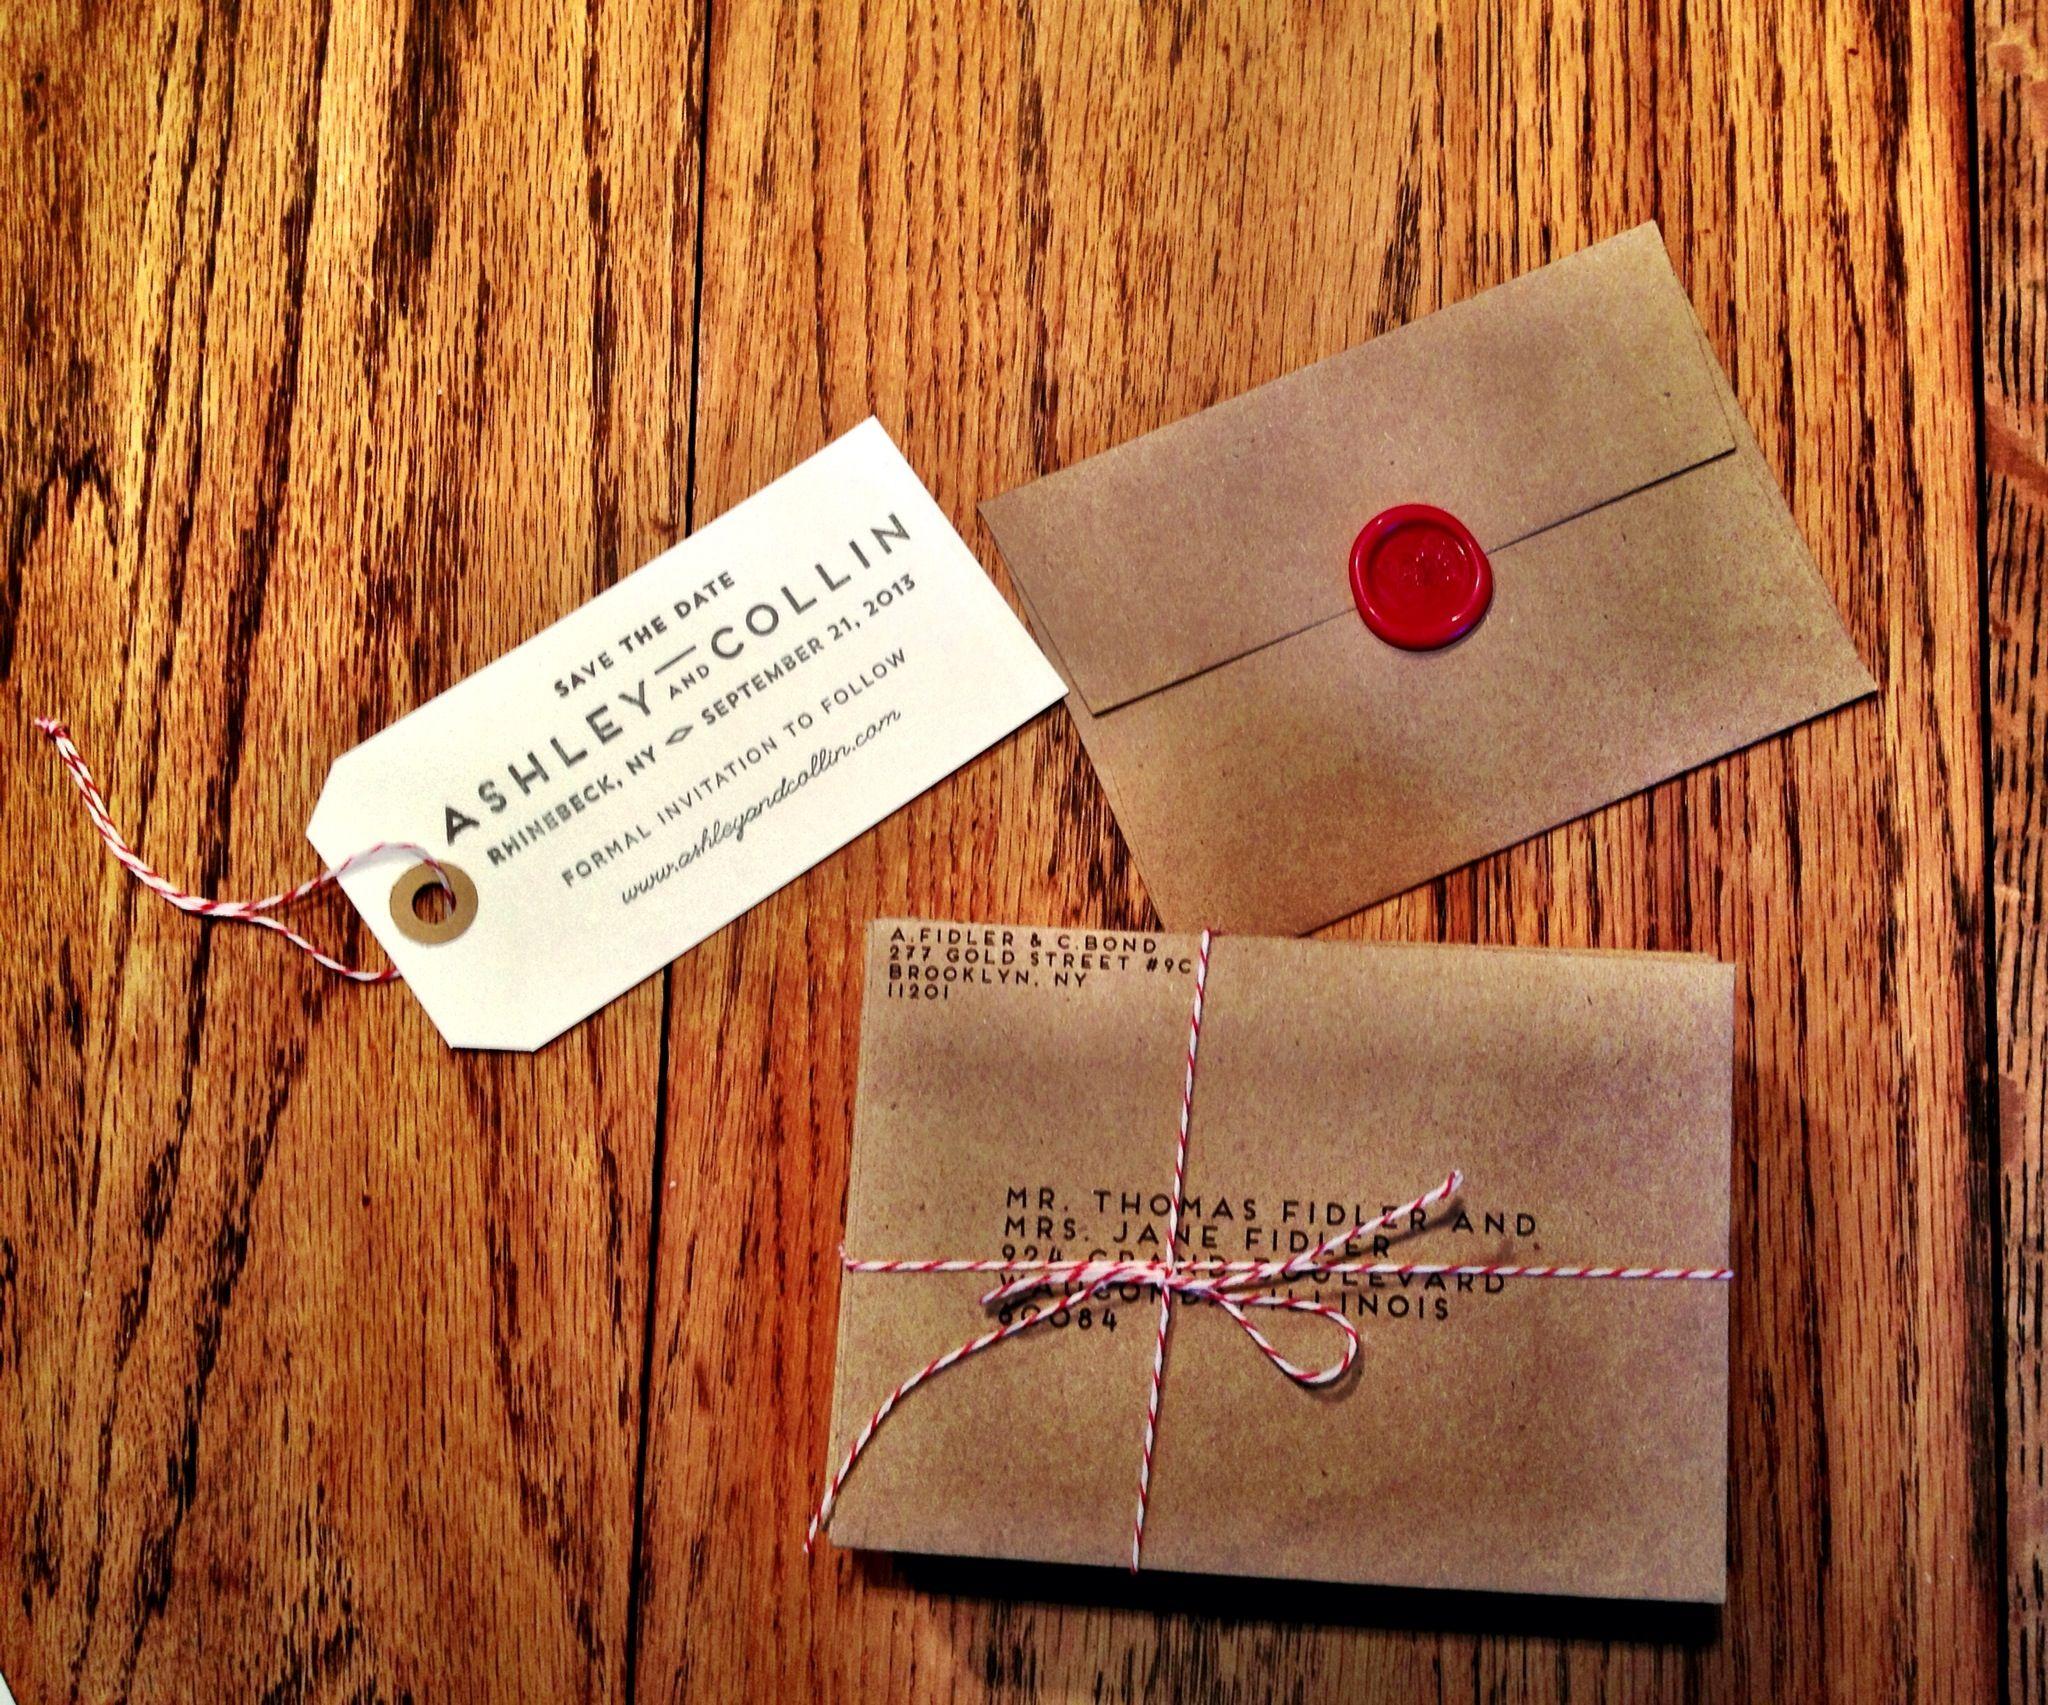 Diy Paper Wedding Invitation: DIY Wedding Invitation And Save The Date